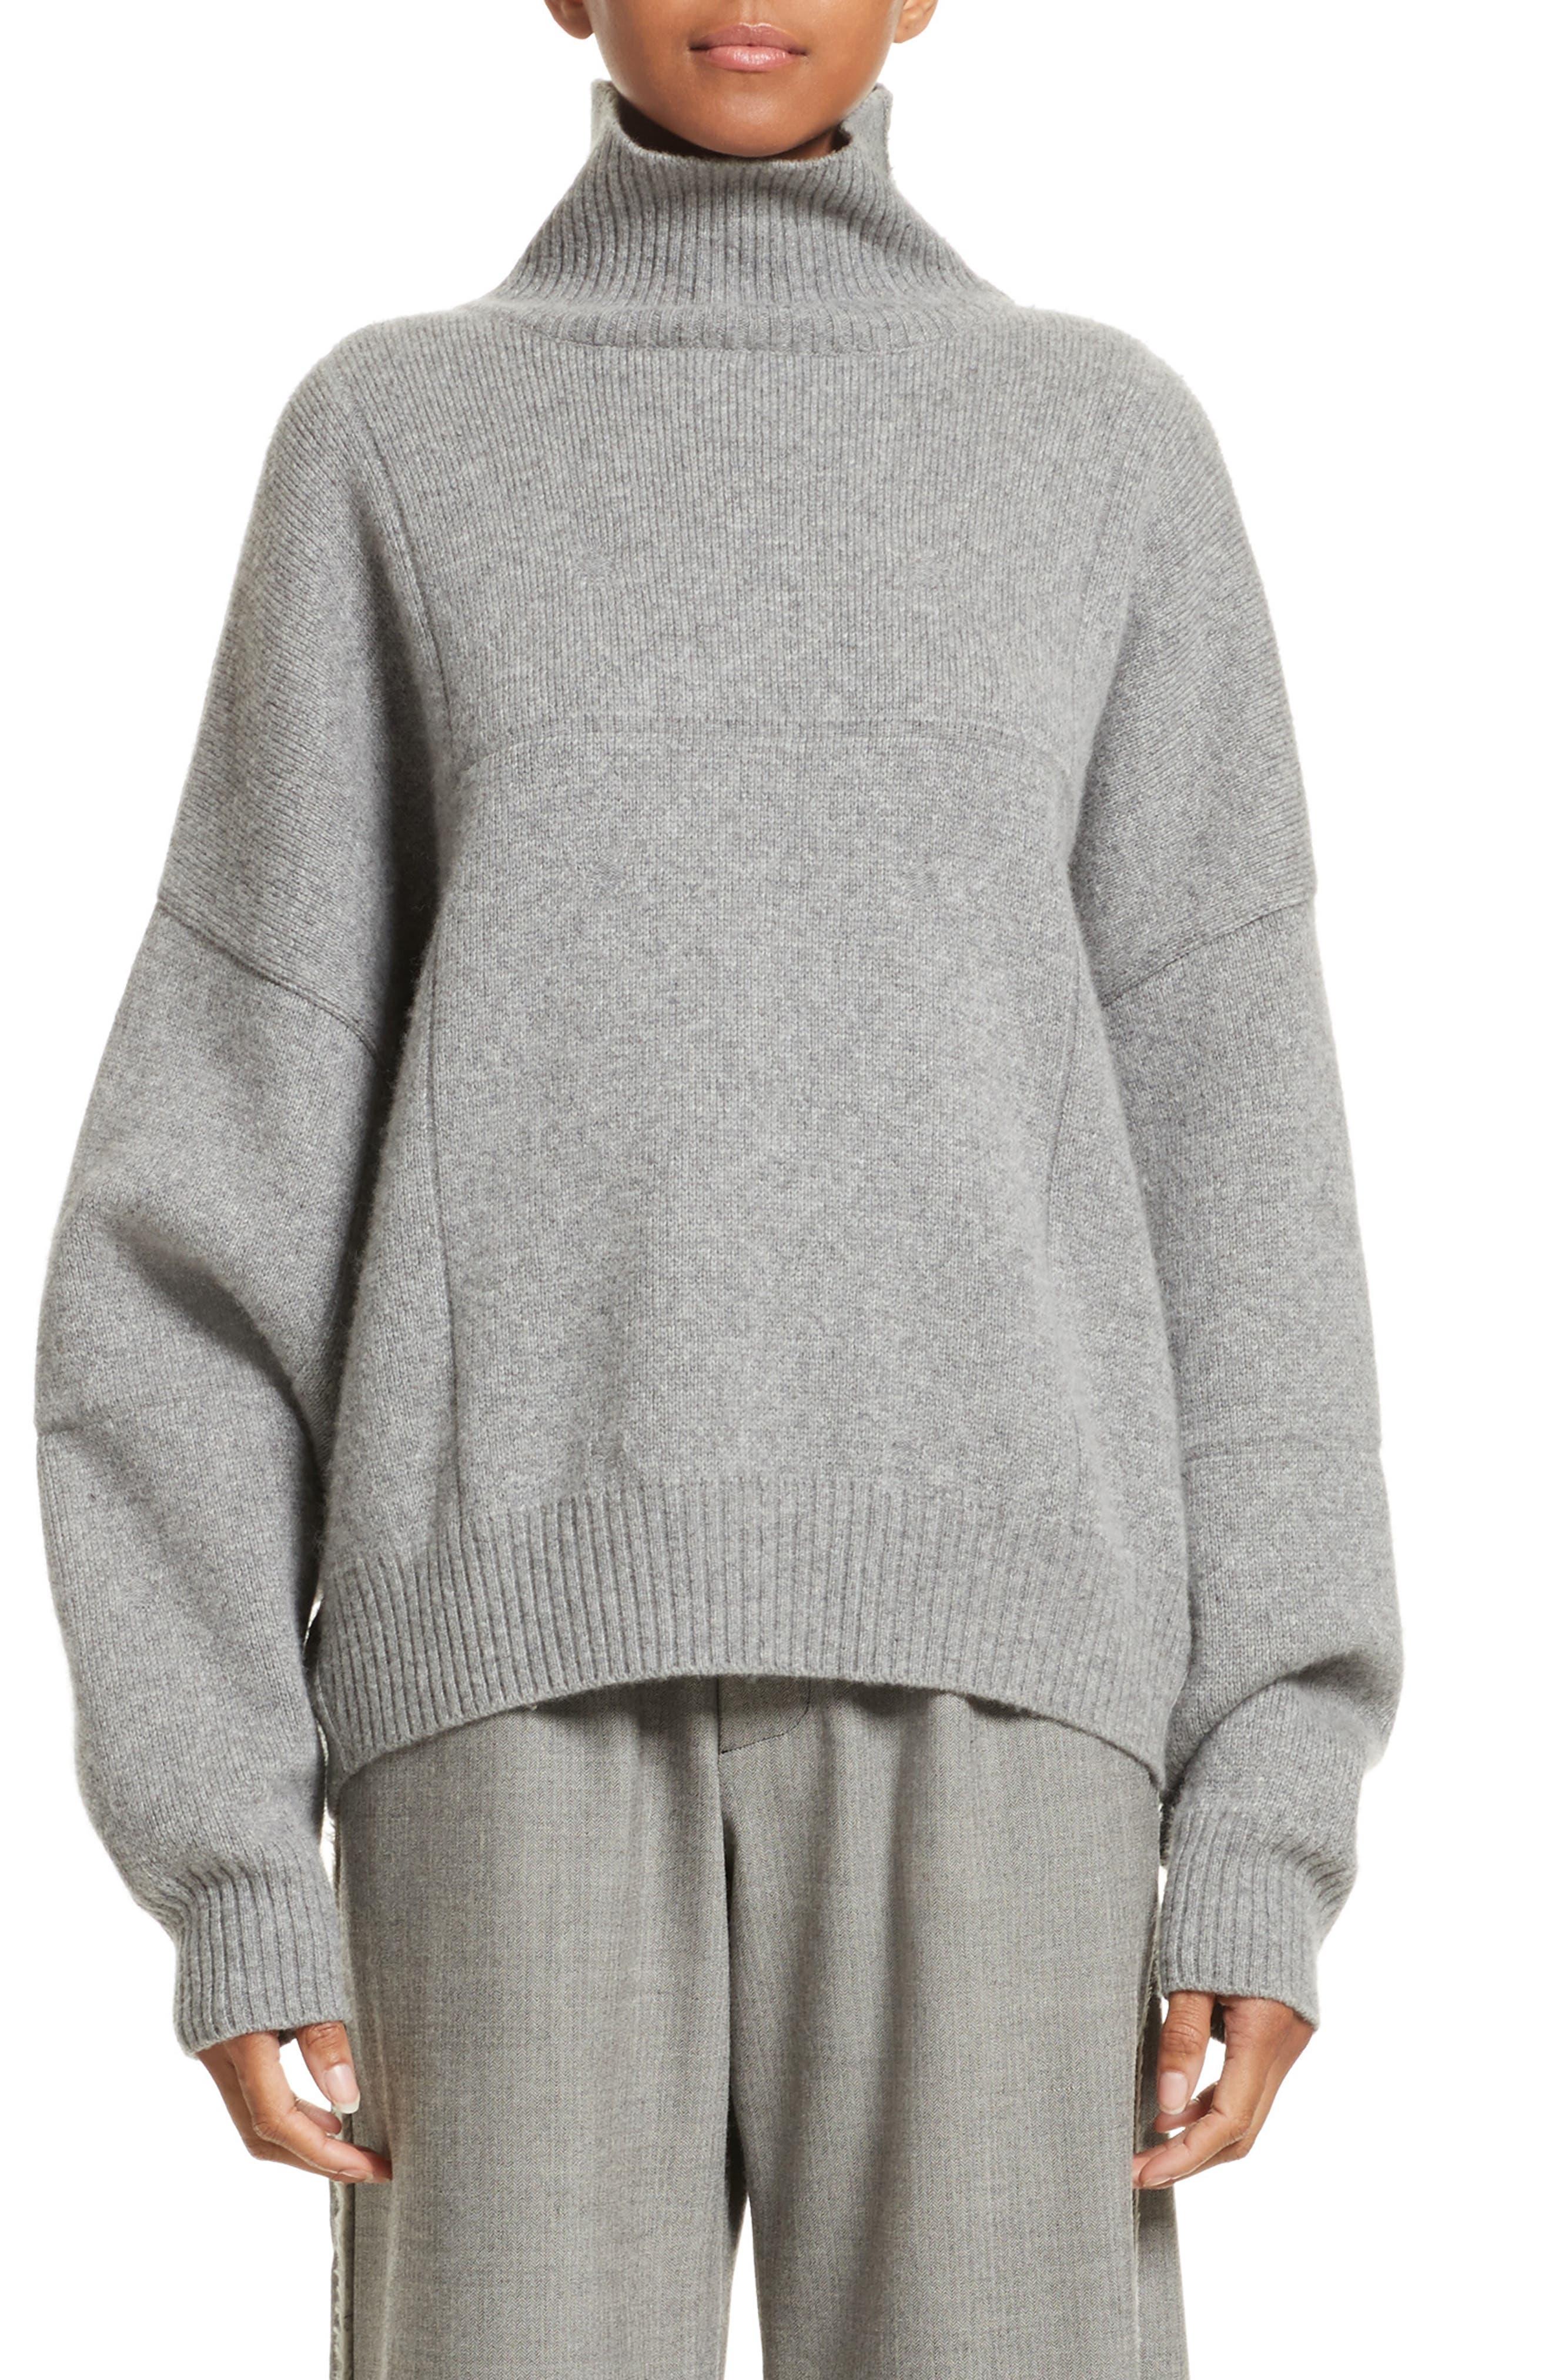 Concrete Wool Turtleneck Sweater,                         Main,                         color, Light Grey